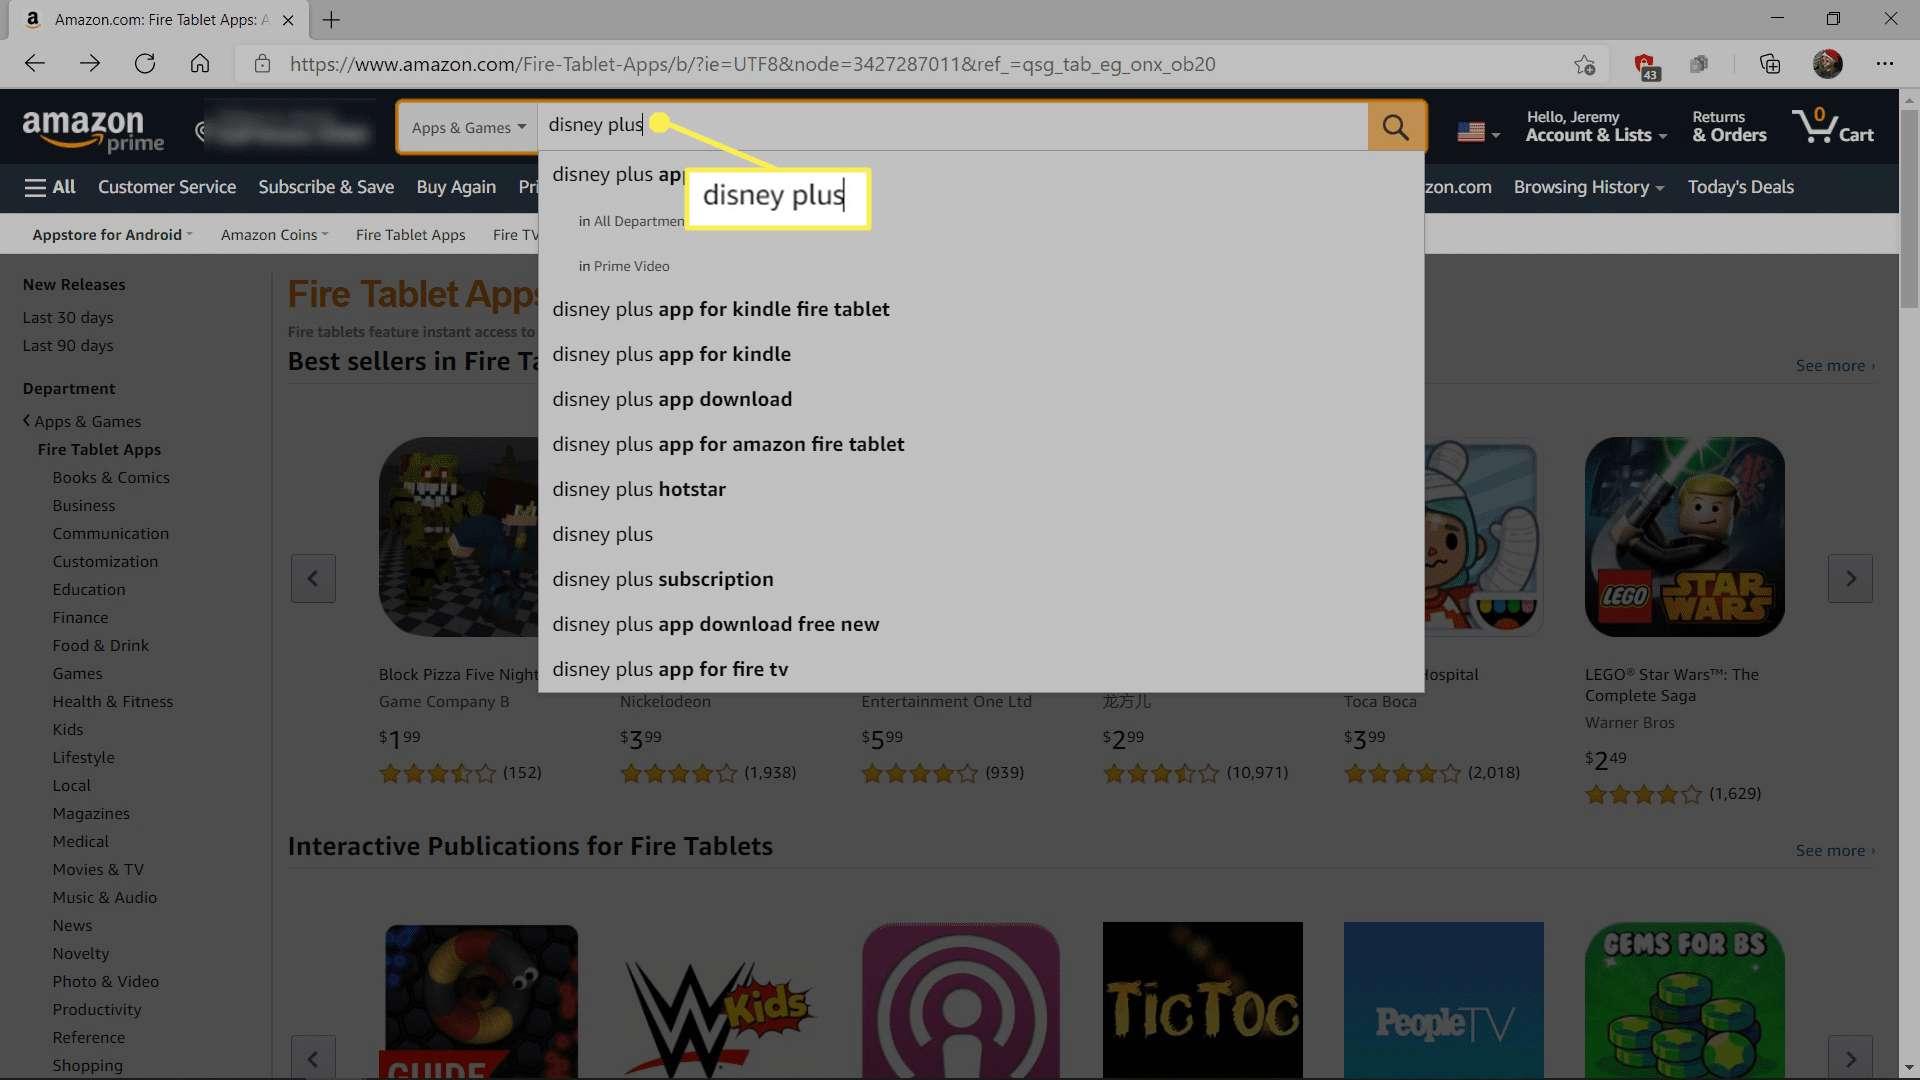 Searching for Disney Plus on Amazon.